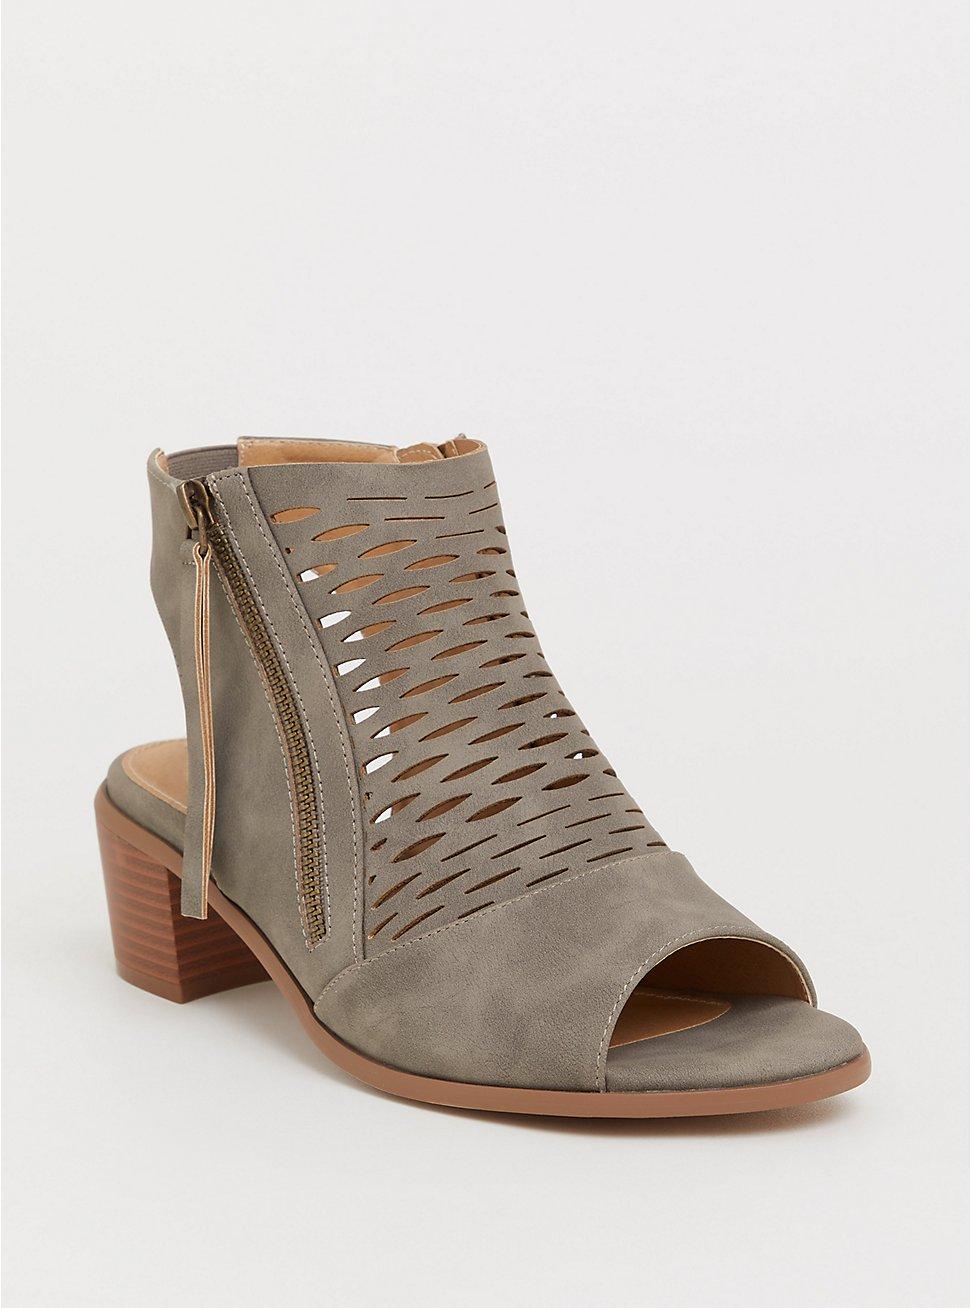 Plus Size Grey Faux Suede Woven Block Heel Bootie (WW), GREY, hi-res